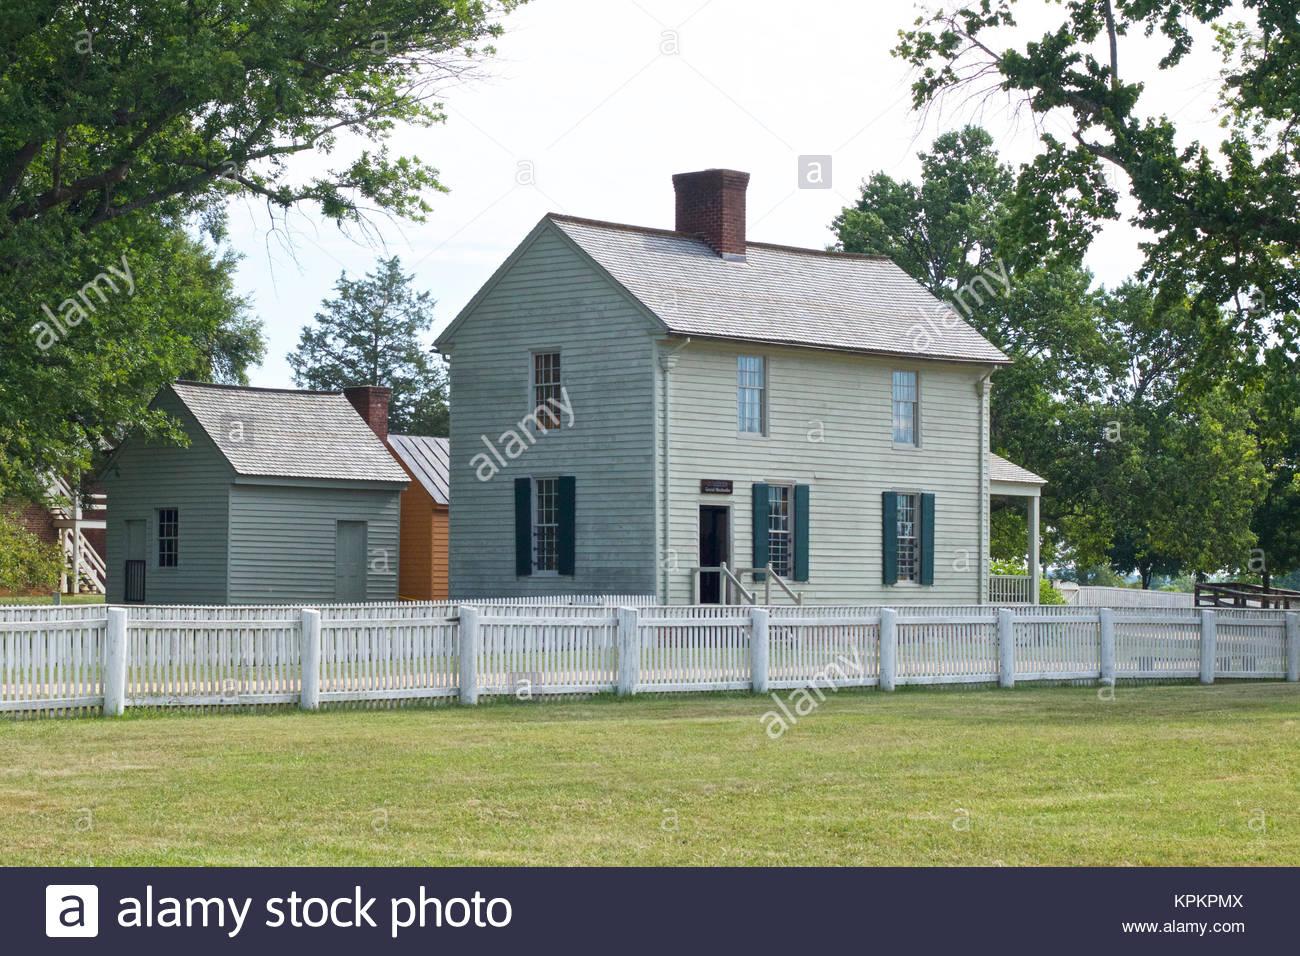 Appomattox Court House National Historical Park - Stock Image